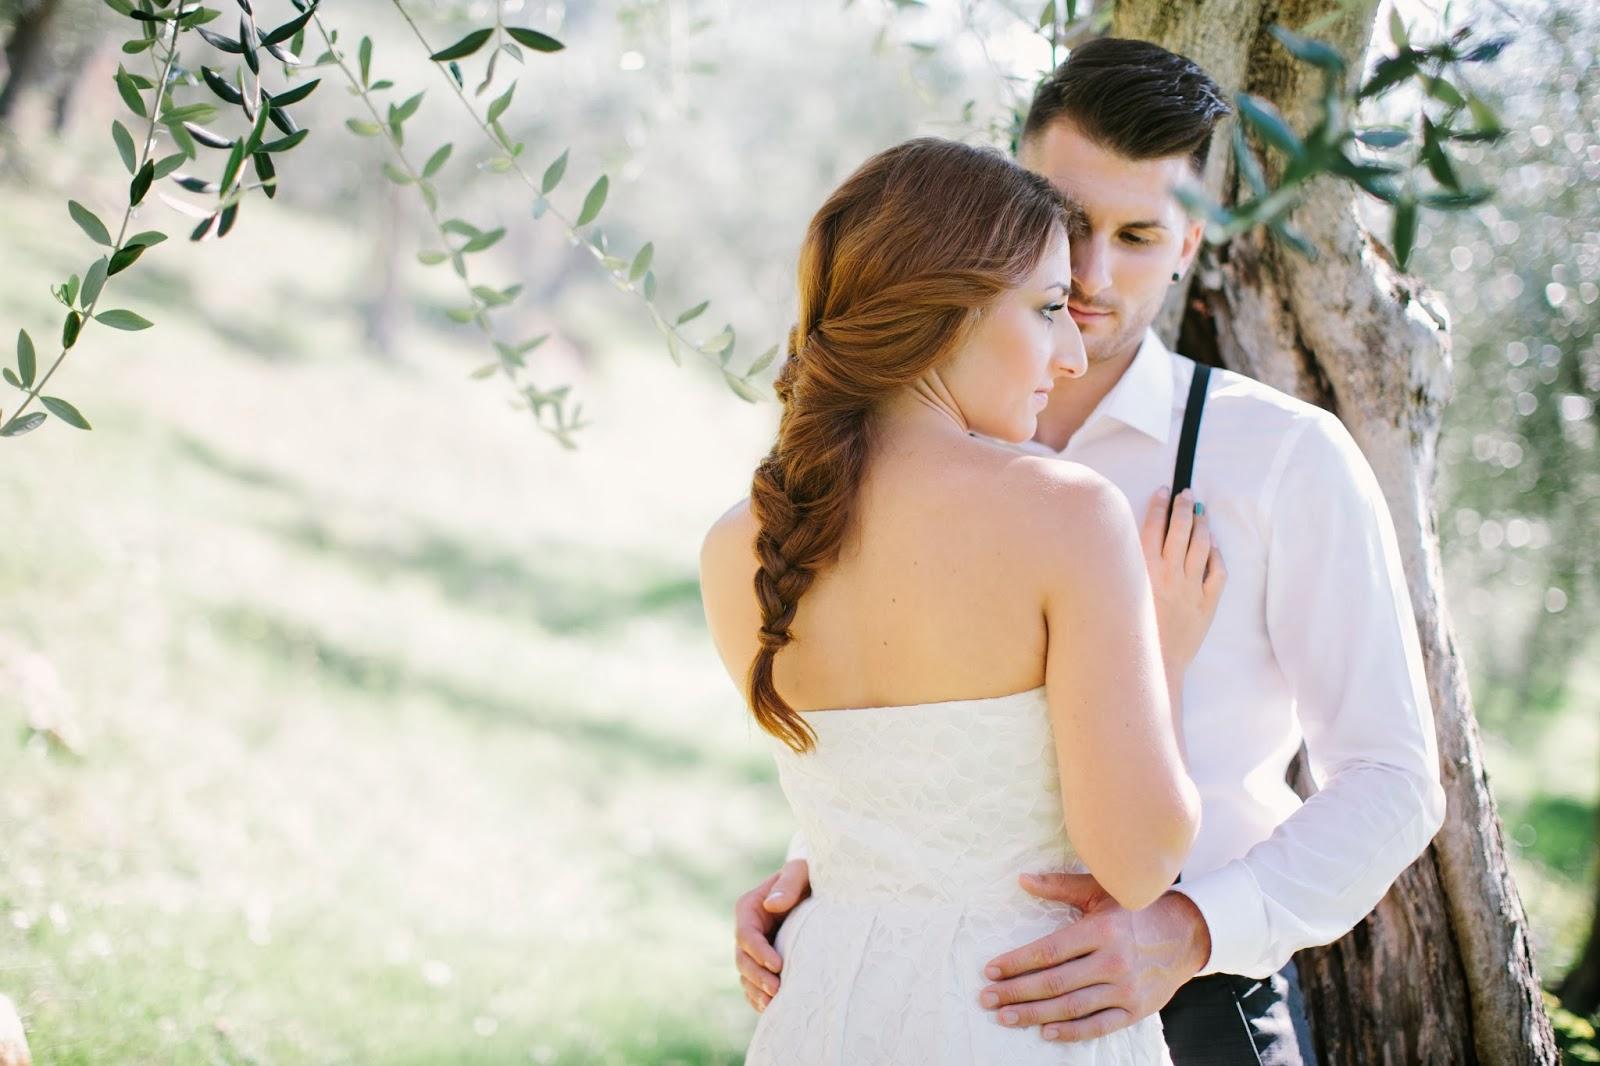 Matrimonio Tra Gli Ulivi Toscana : Matrimonio in toscana romantico shooting tra gli